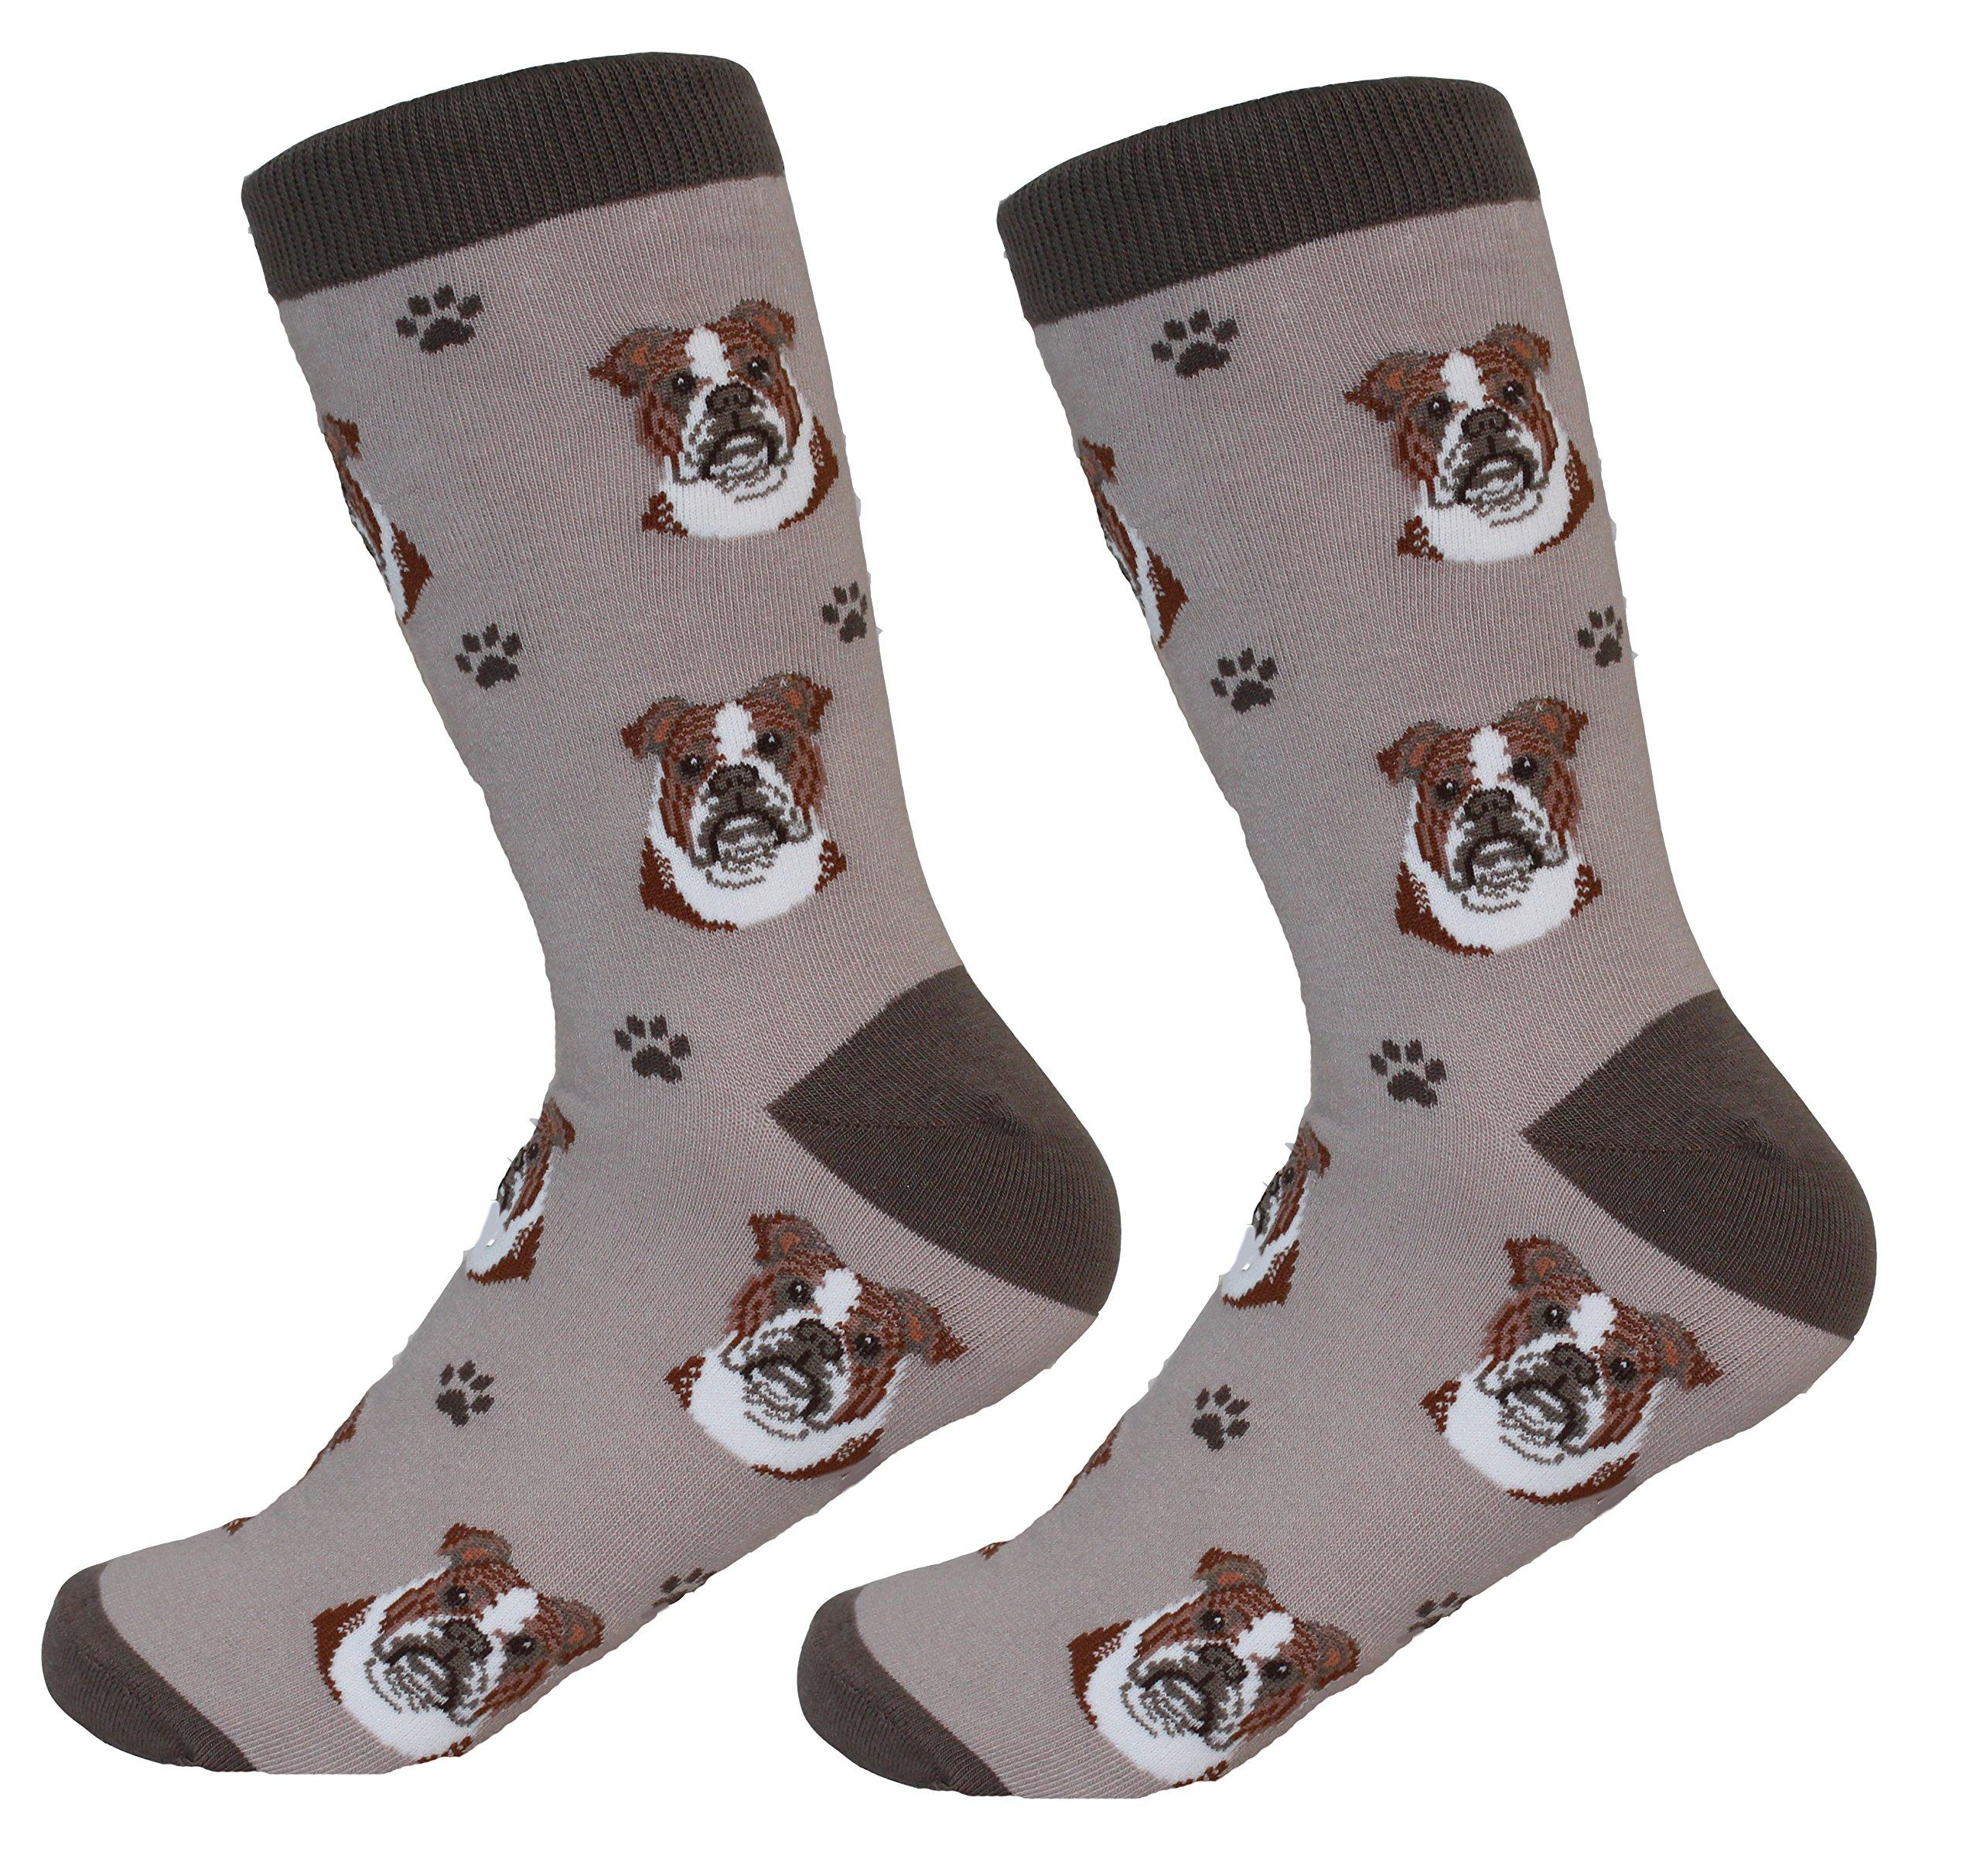 Bulldog Socks - Soft and Comfortable - Unisex 1